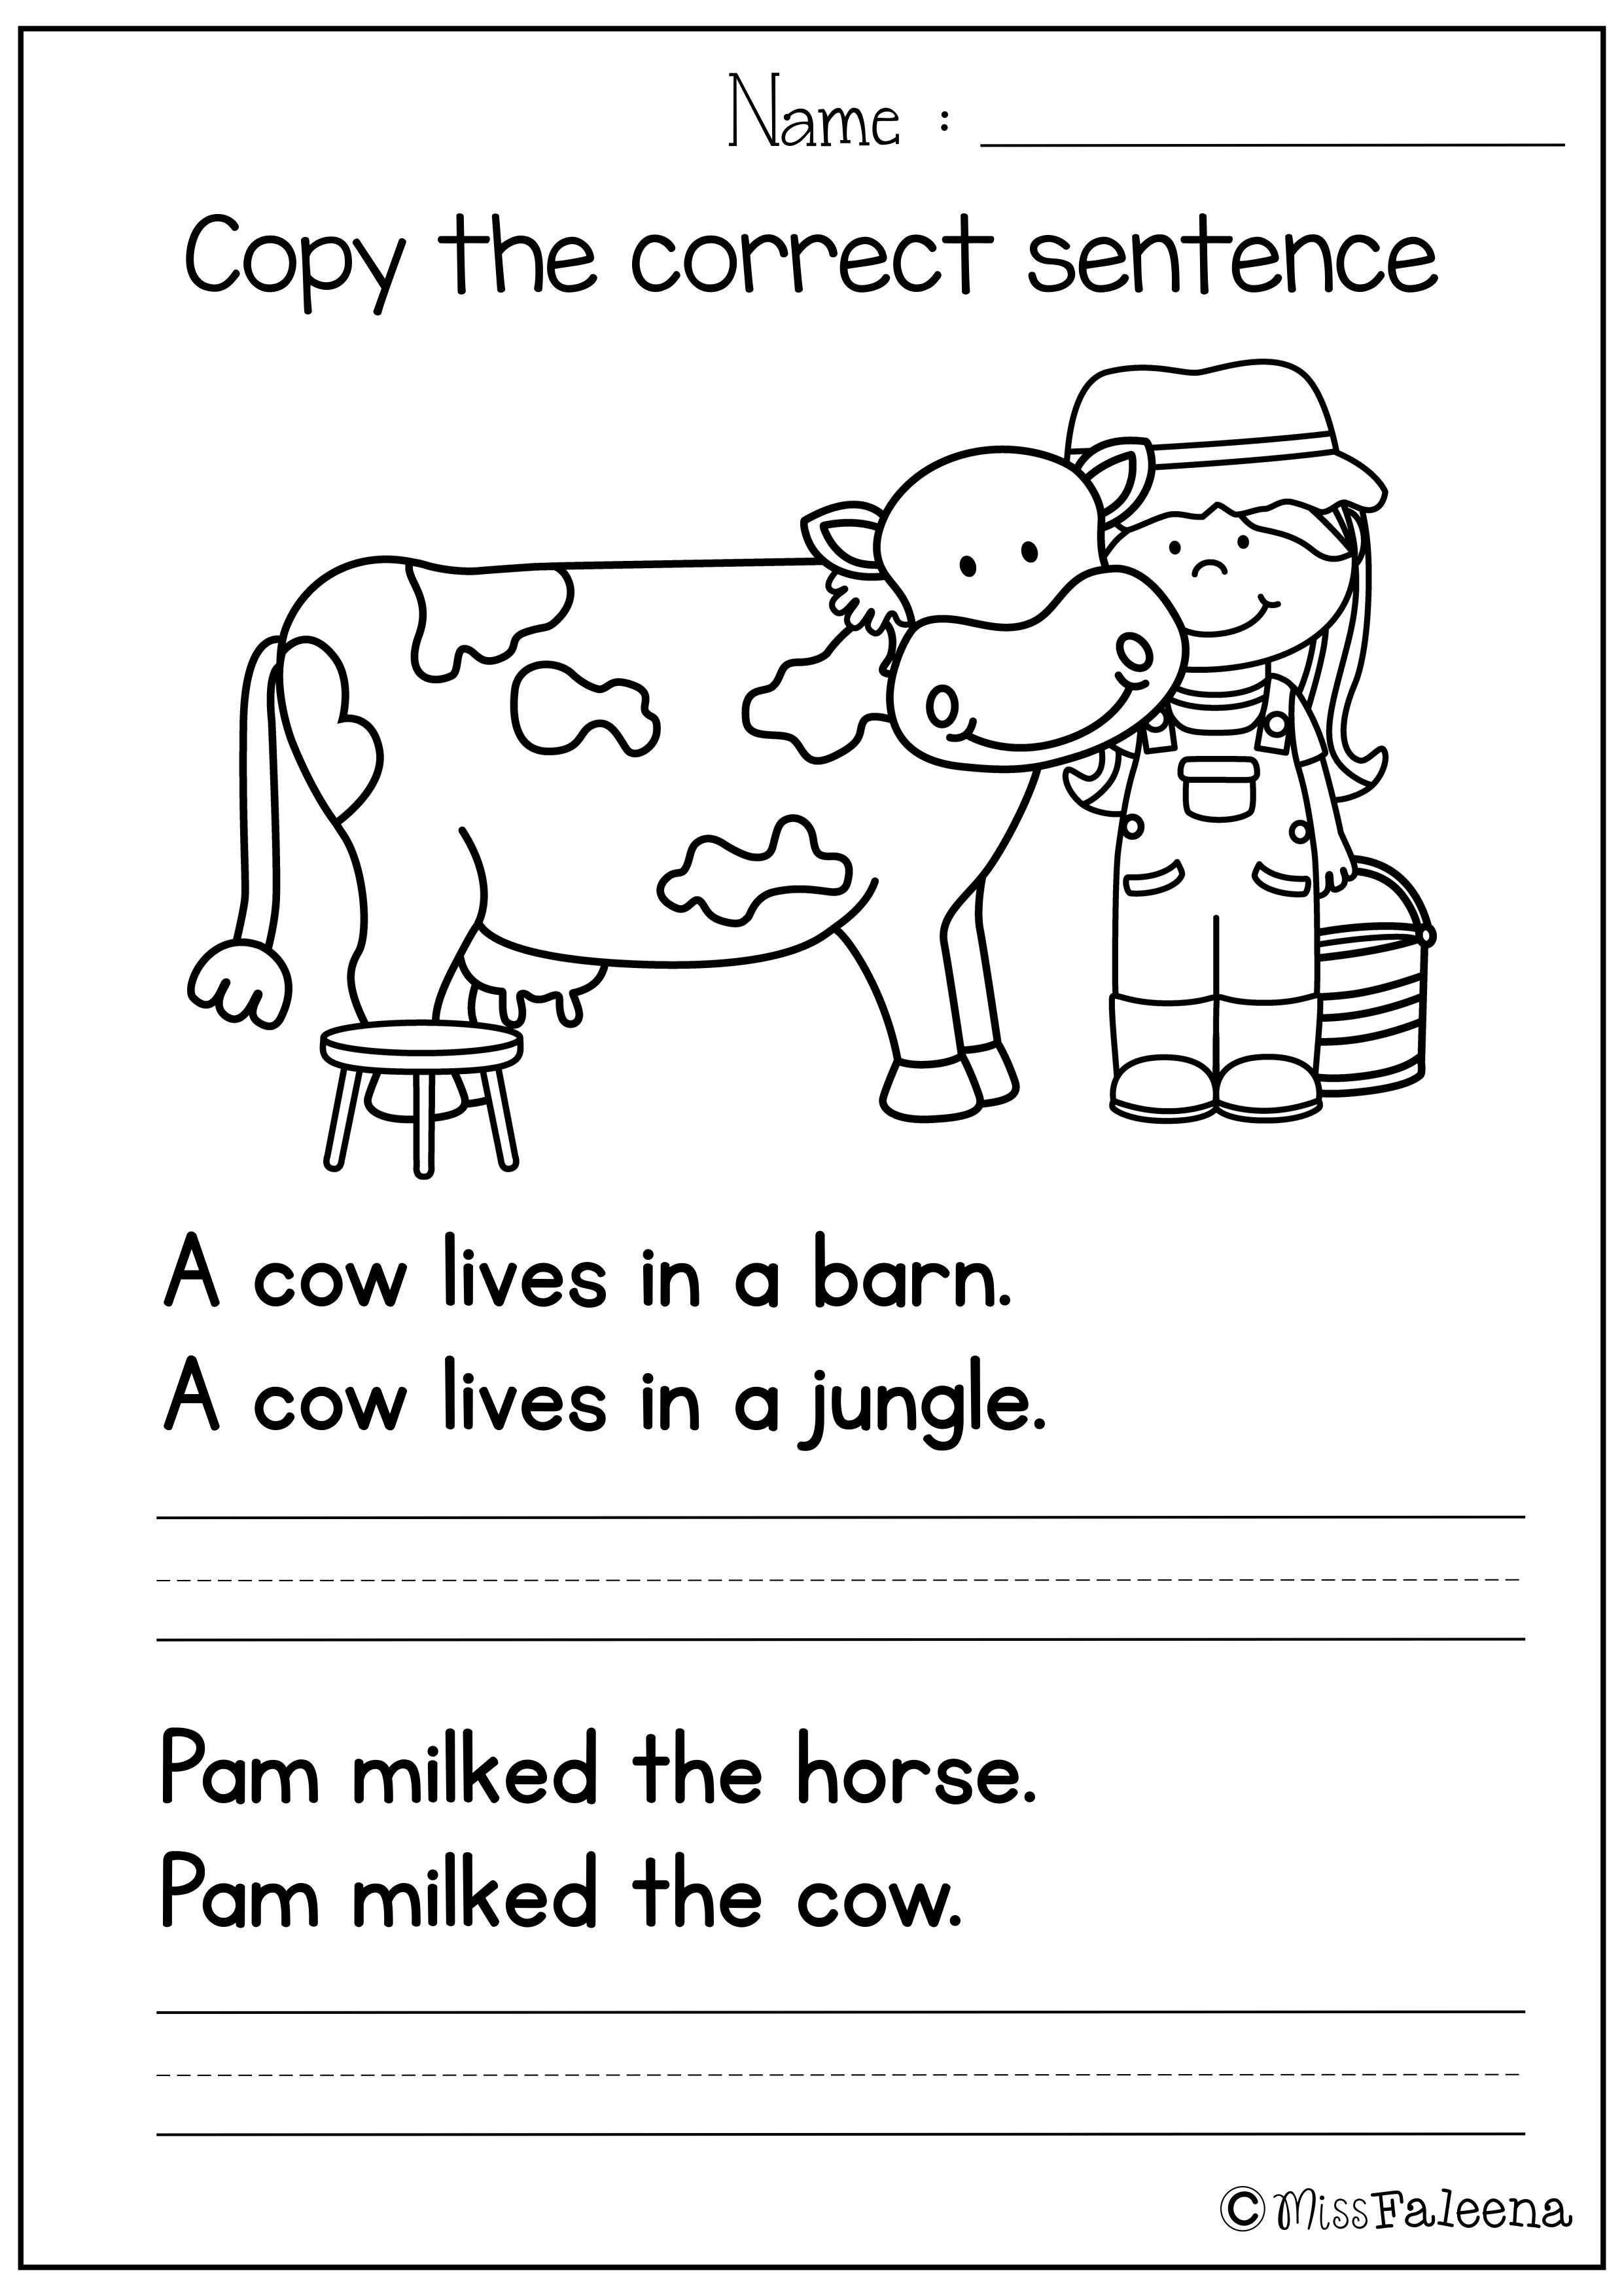 Unscramble Sentences Worksheets 1st Grade Free Sentence Writing Copy the Correct Sentence